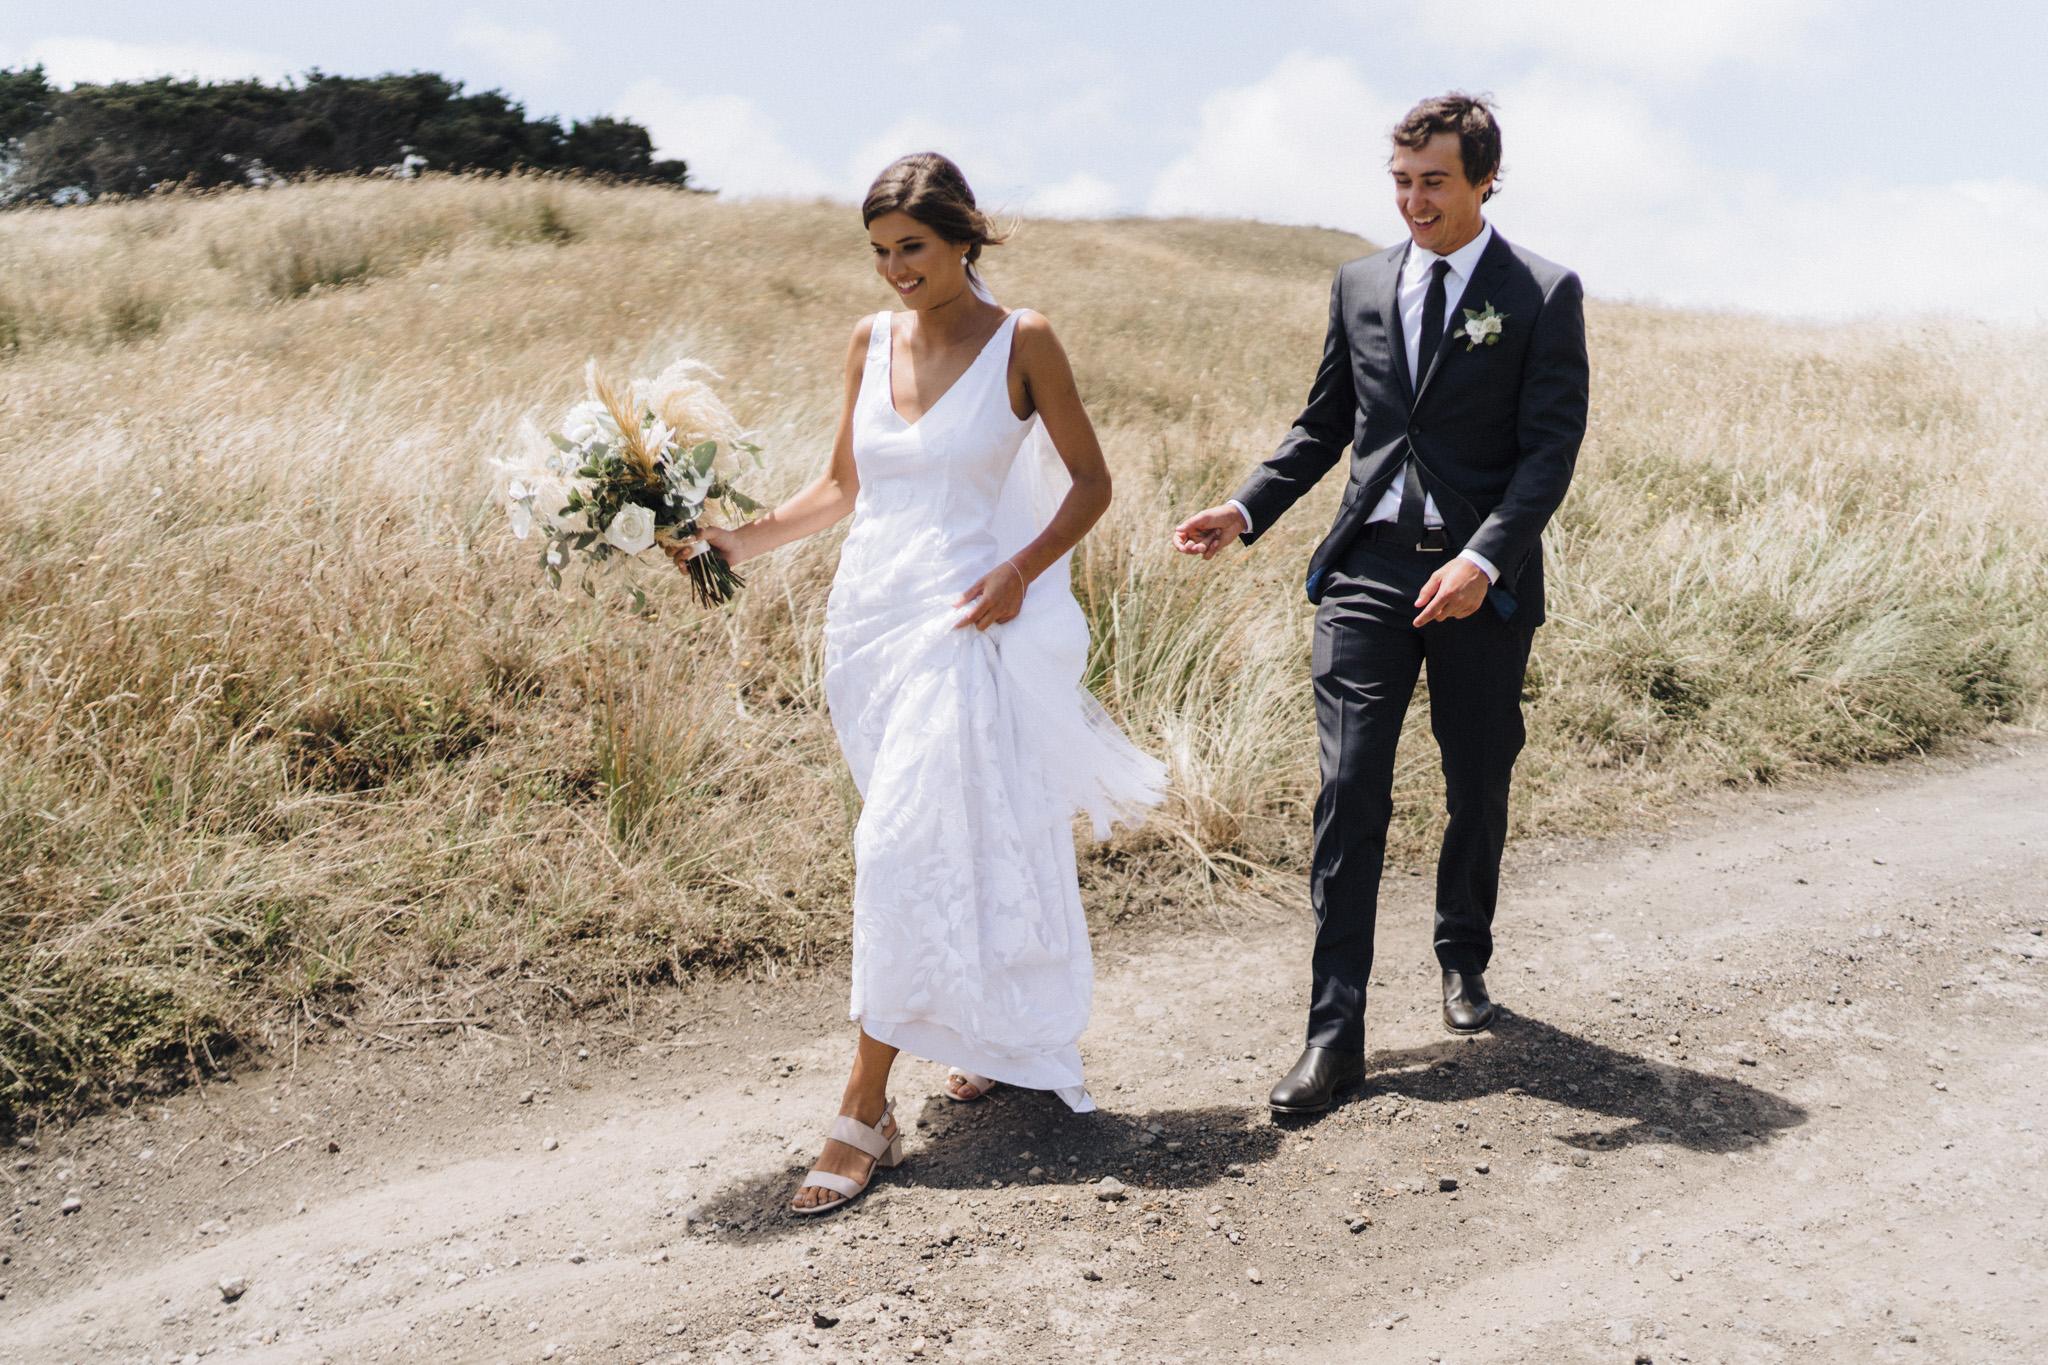 newfound-h-m-castaways-waiuku-auckland-wedding-photographer-46